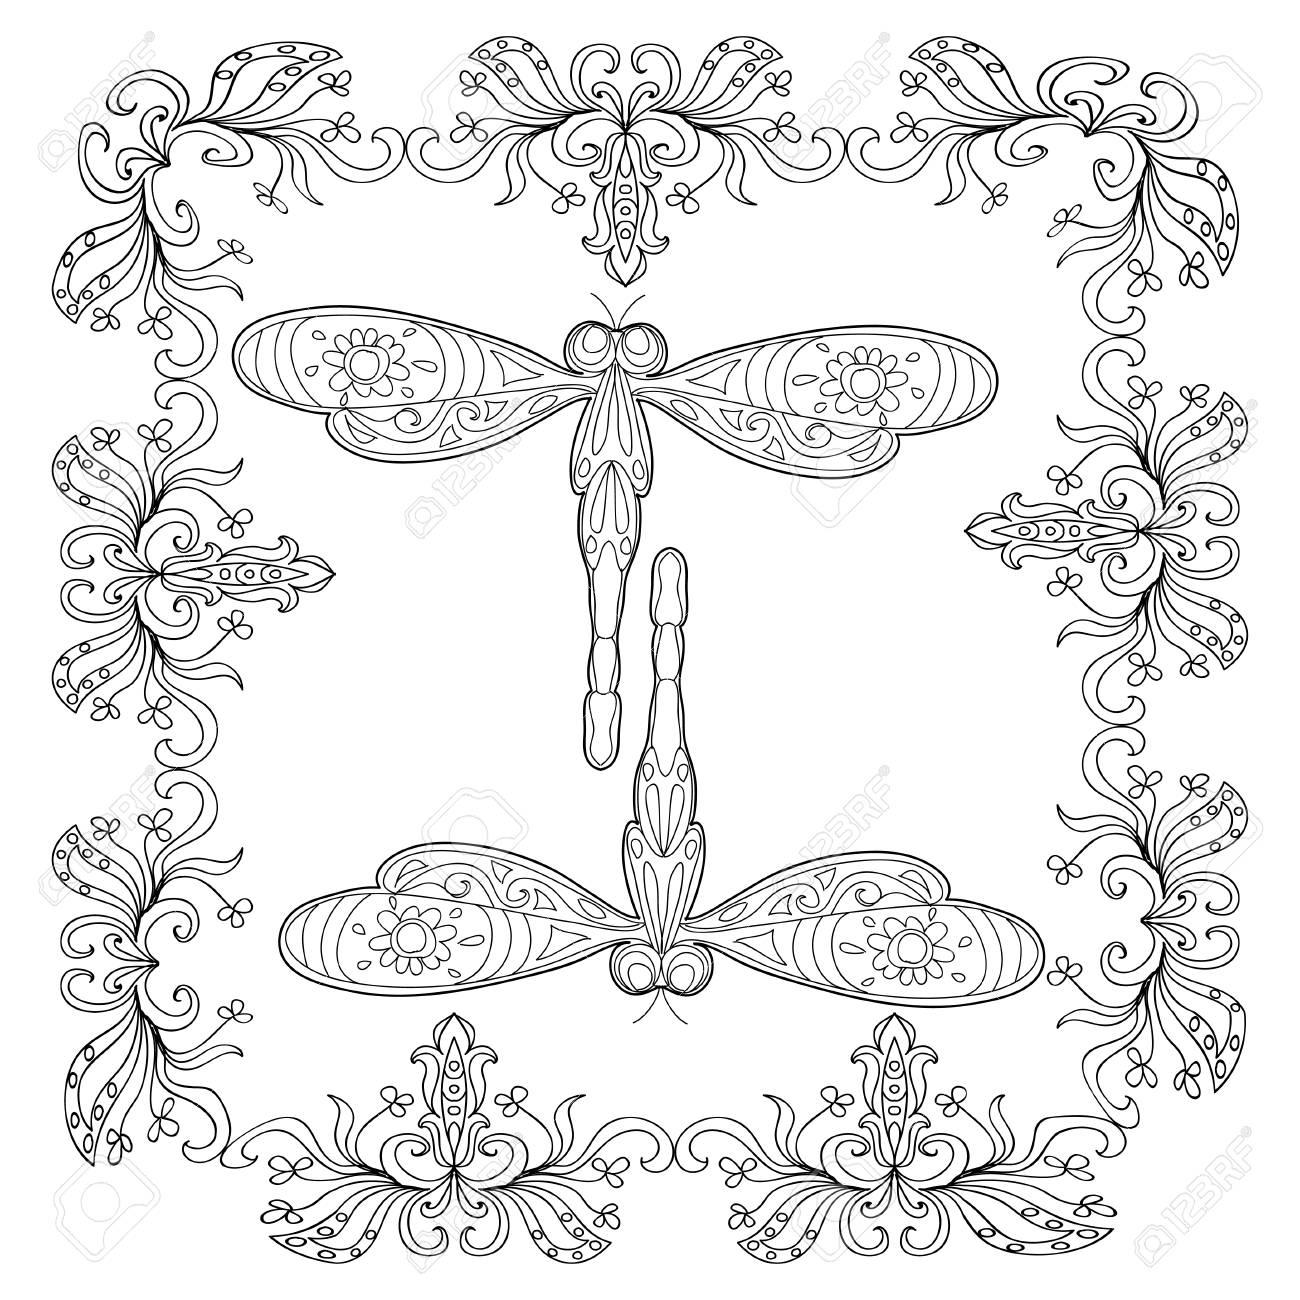 Página Para Colorear De Mandala Abstracta De Libélula Ilustraciones ...